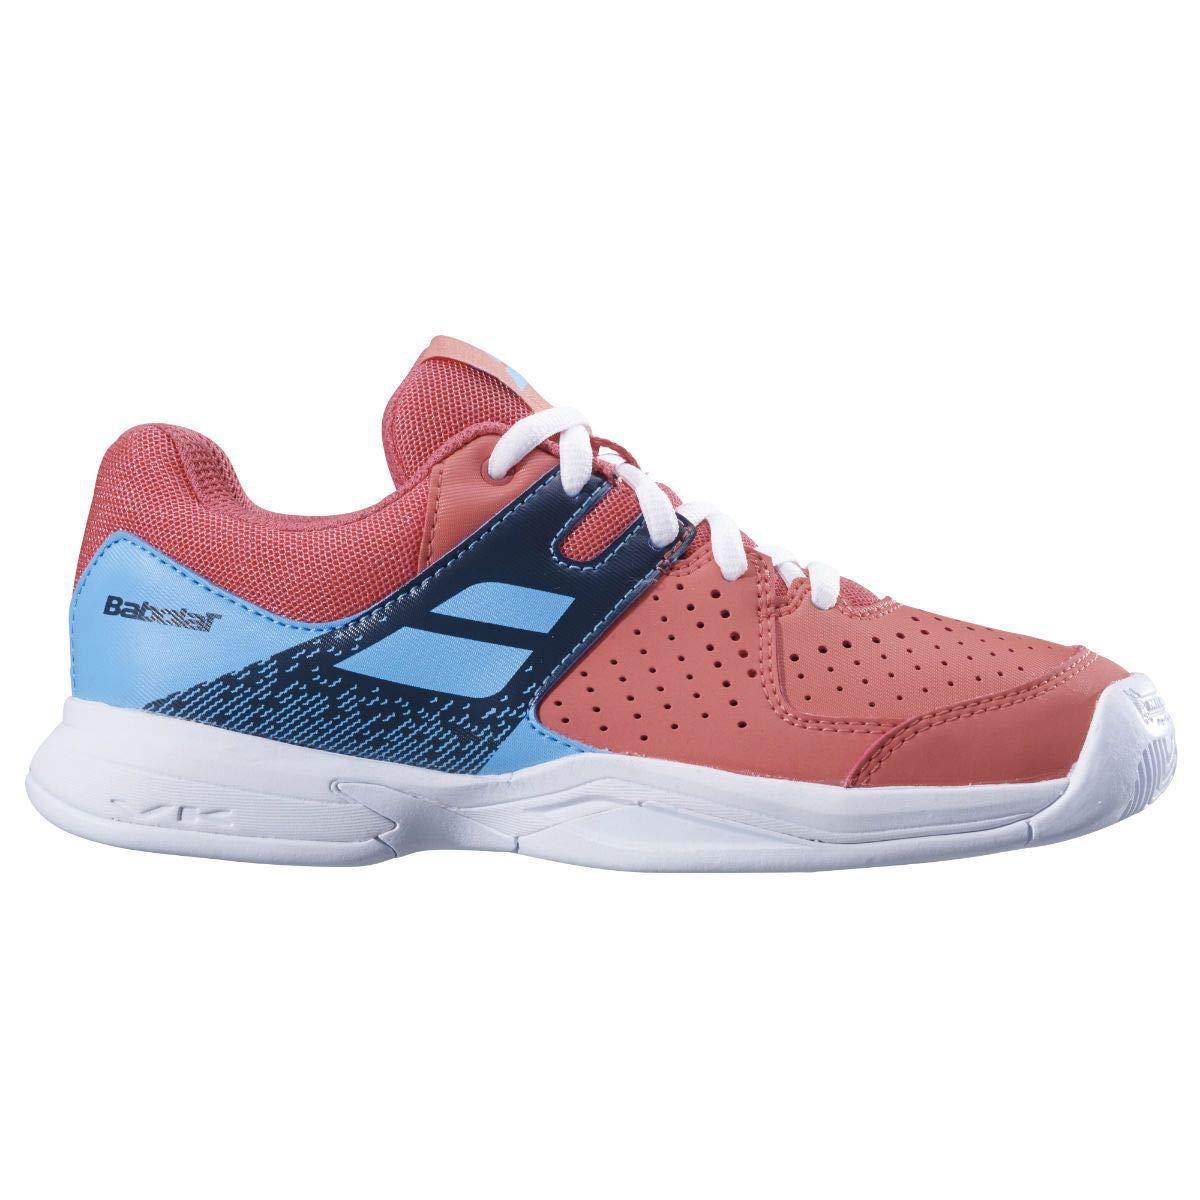 K-Swiss Performance Girls Court Impact LTR Omni Tennis Shoes